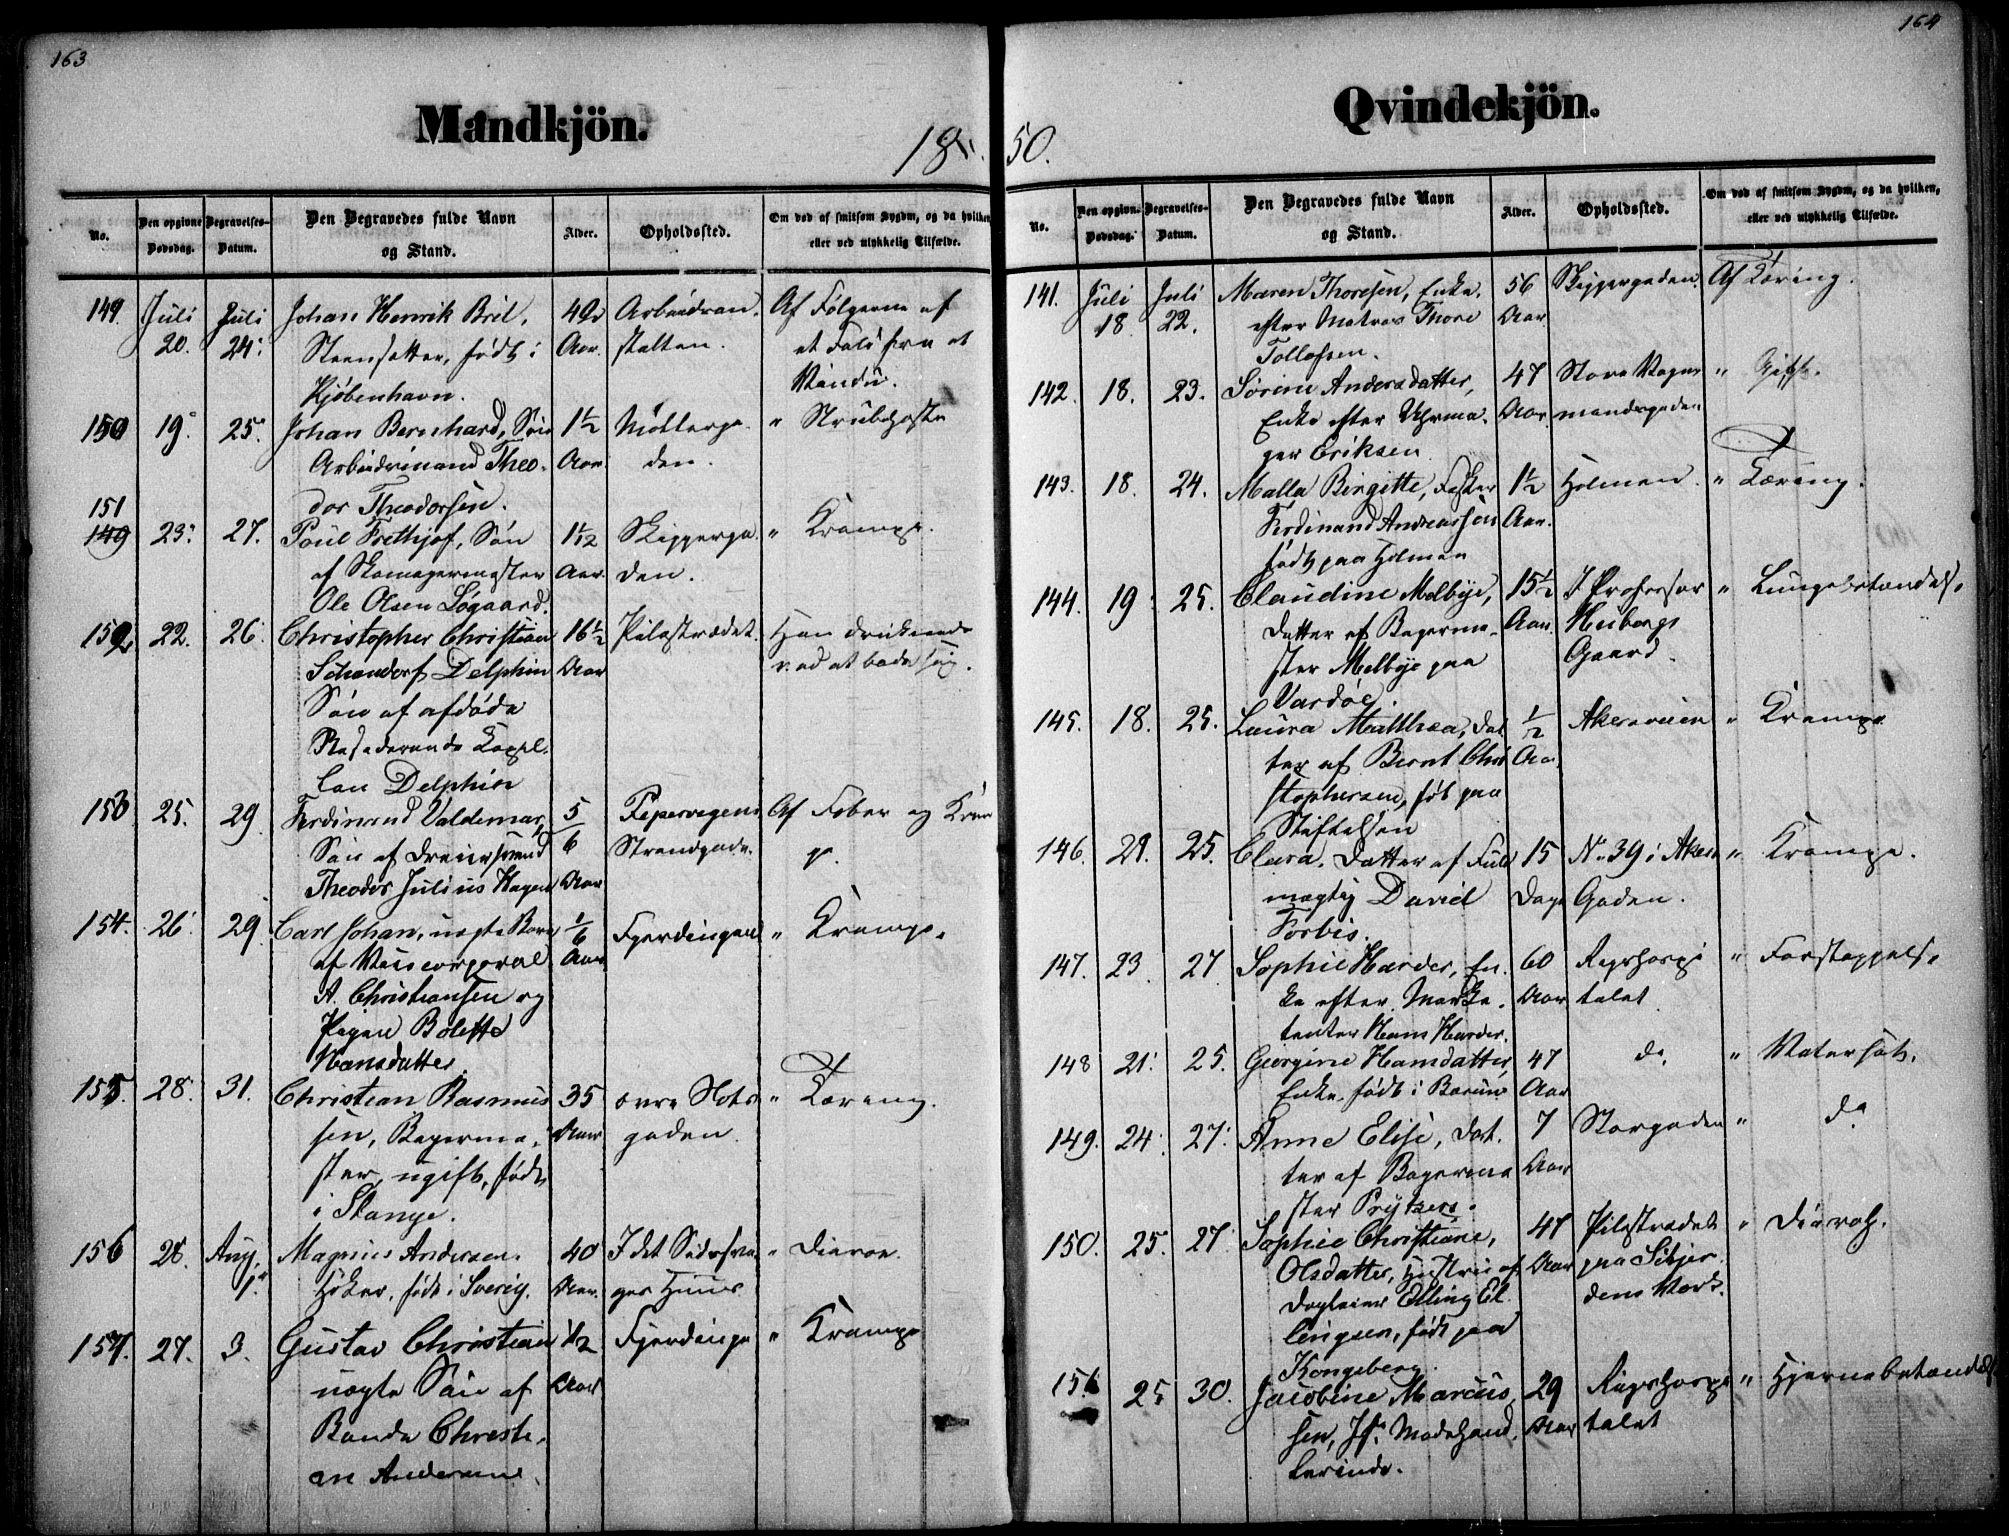 SAO, Oslo domkirke Kirkebøker, F/Fa/L0025: Parish register (official) no. 25, 1847-1867, p. 163-164